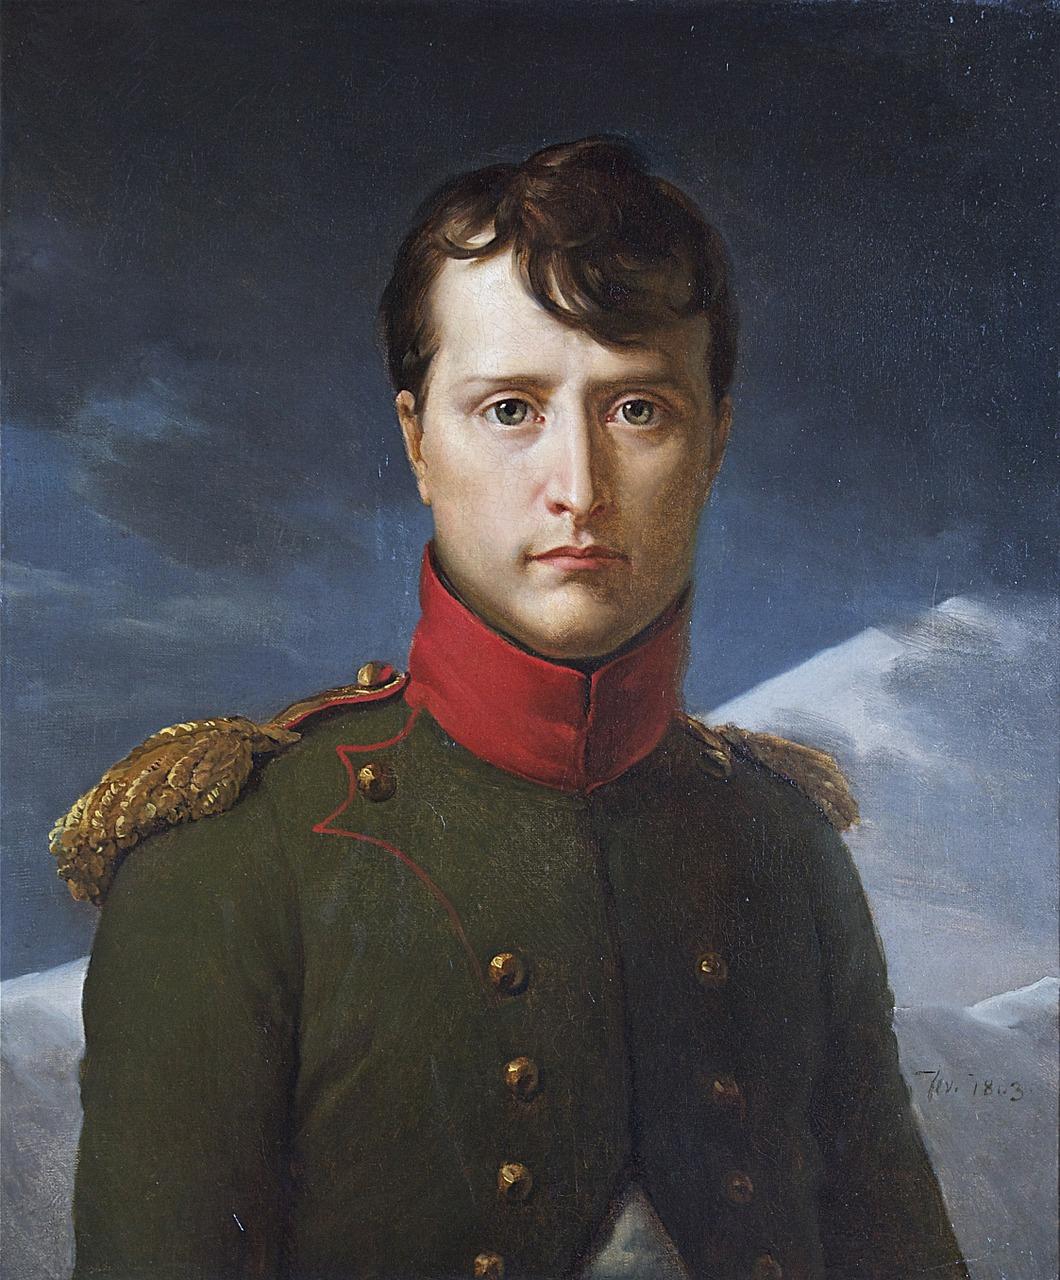 Наполеон Бонапарт фото